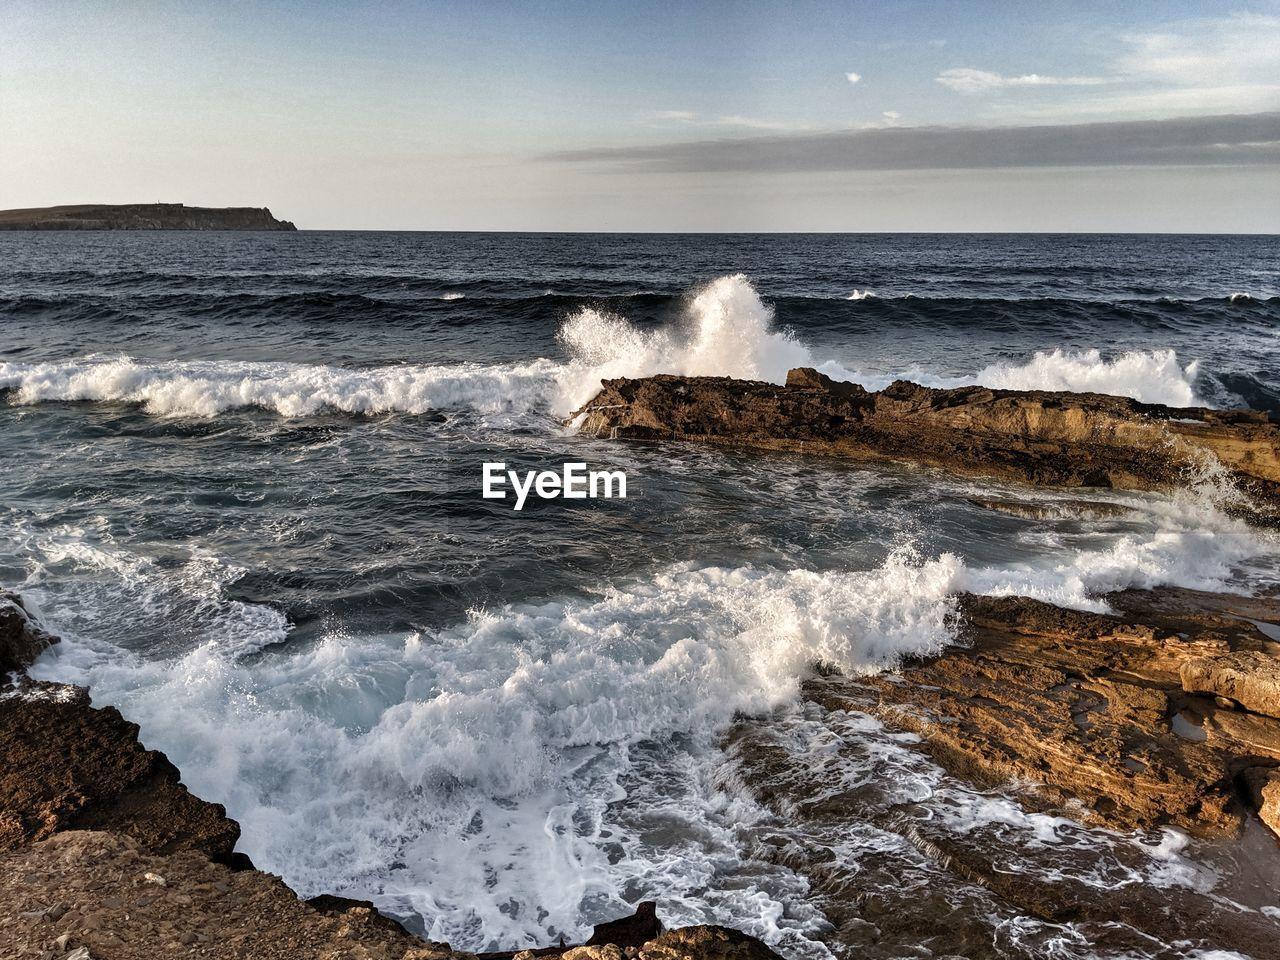 sea, wave, water, motion, horizon over water, horizon, beauty in nature, beach, aquatic sport, sky, sport, scenics - nature, land, surfing, power, nature, rock, power in nature, outdoors, breaking